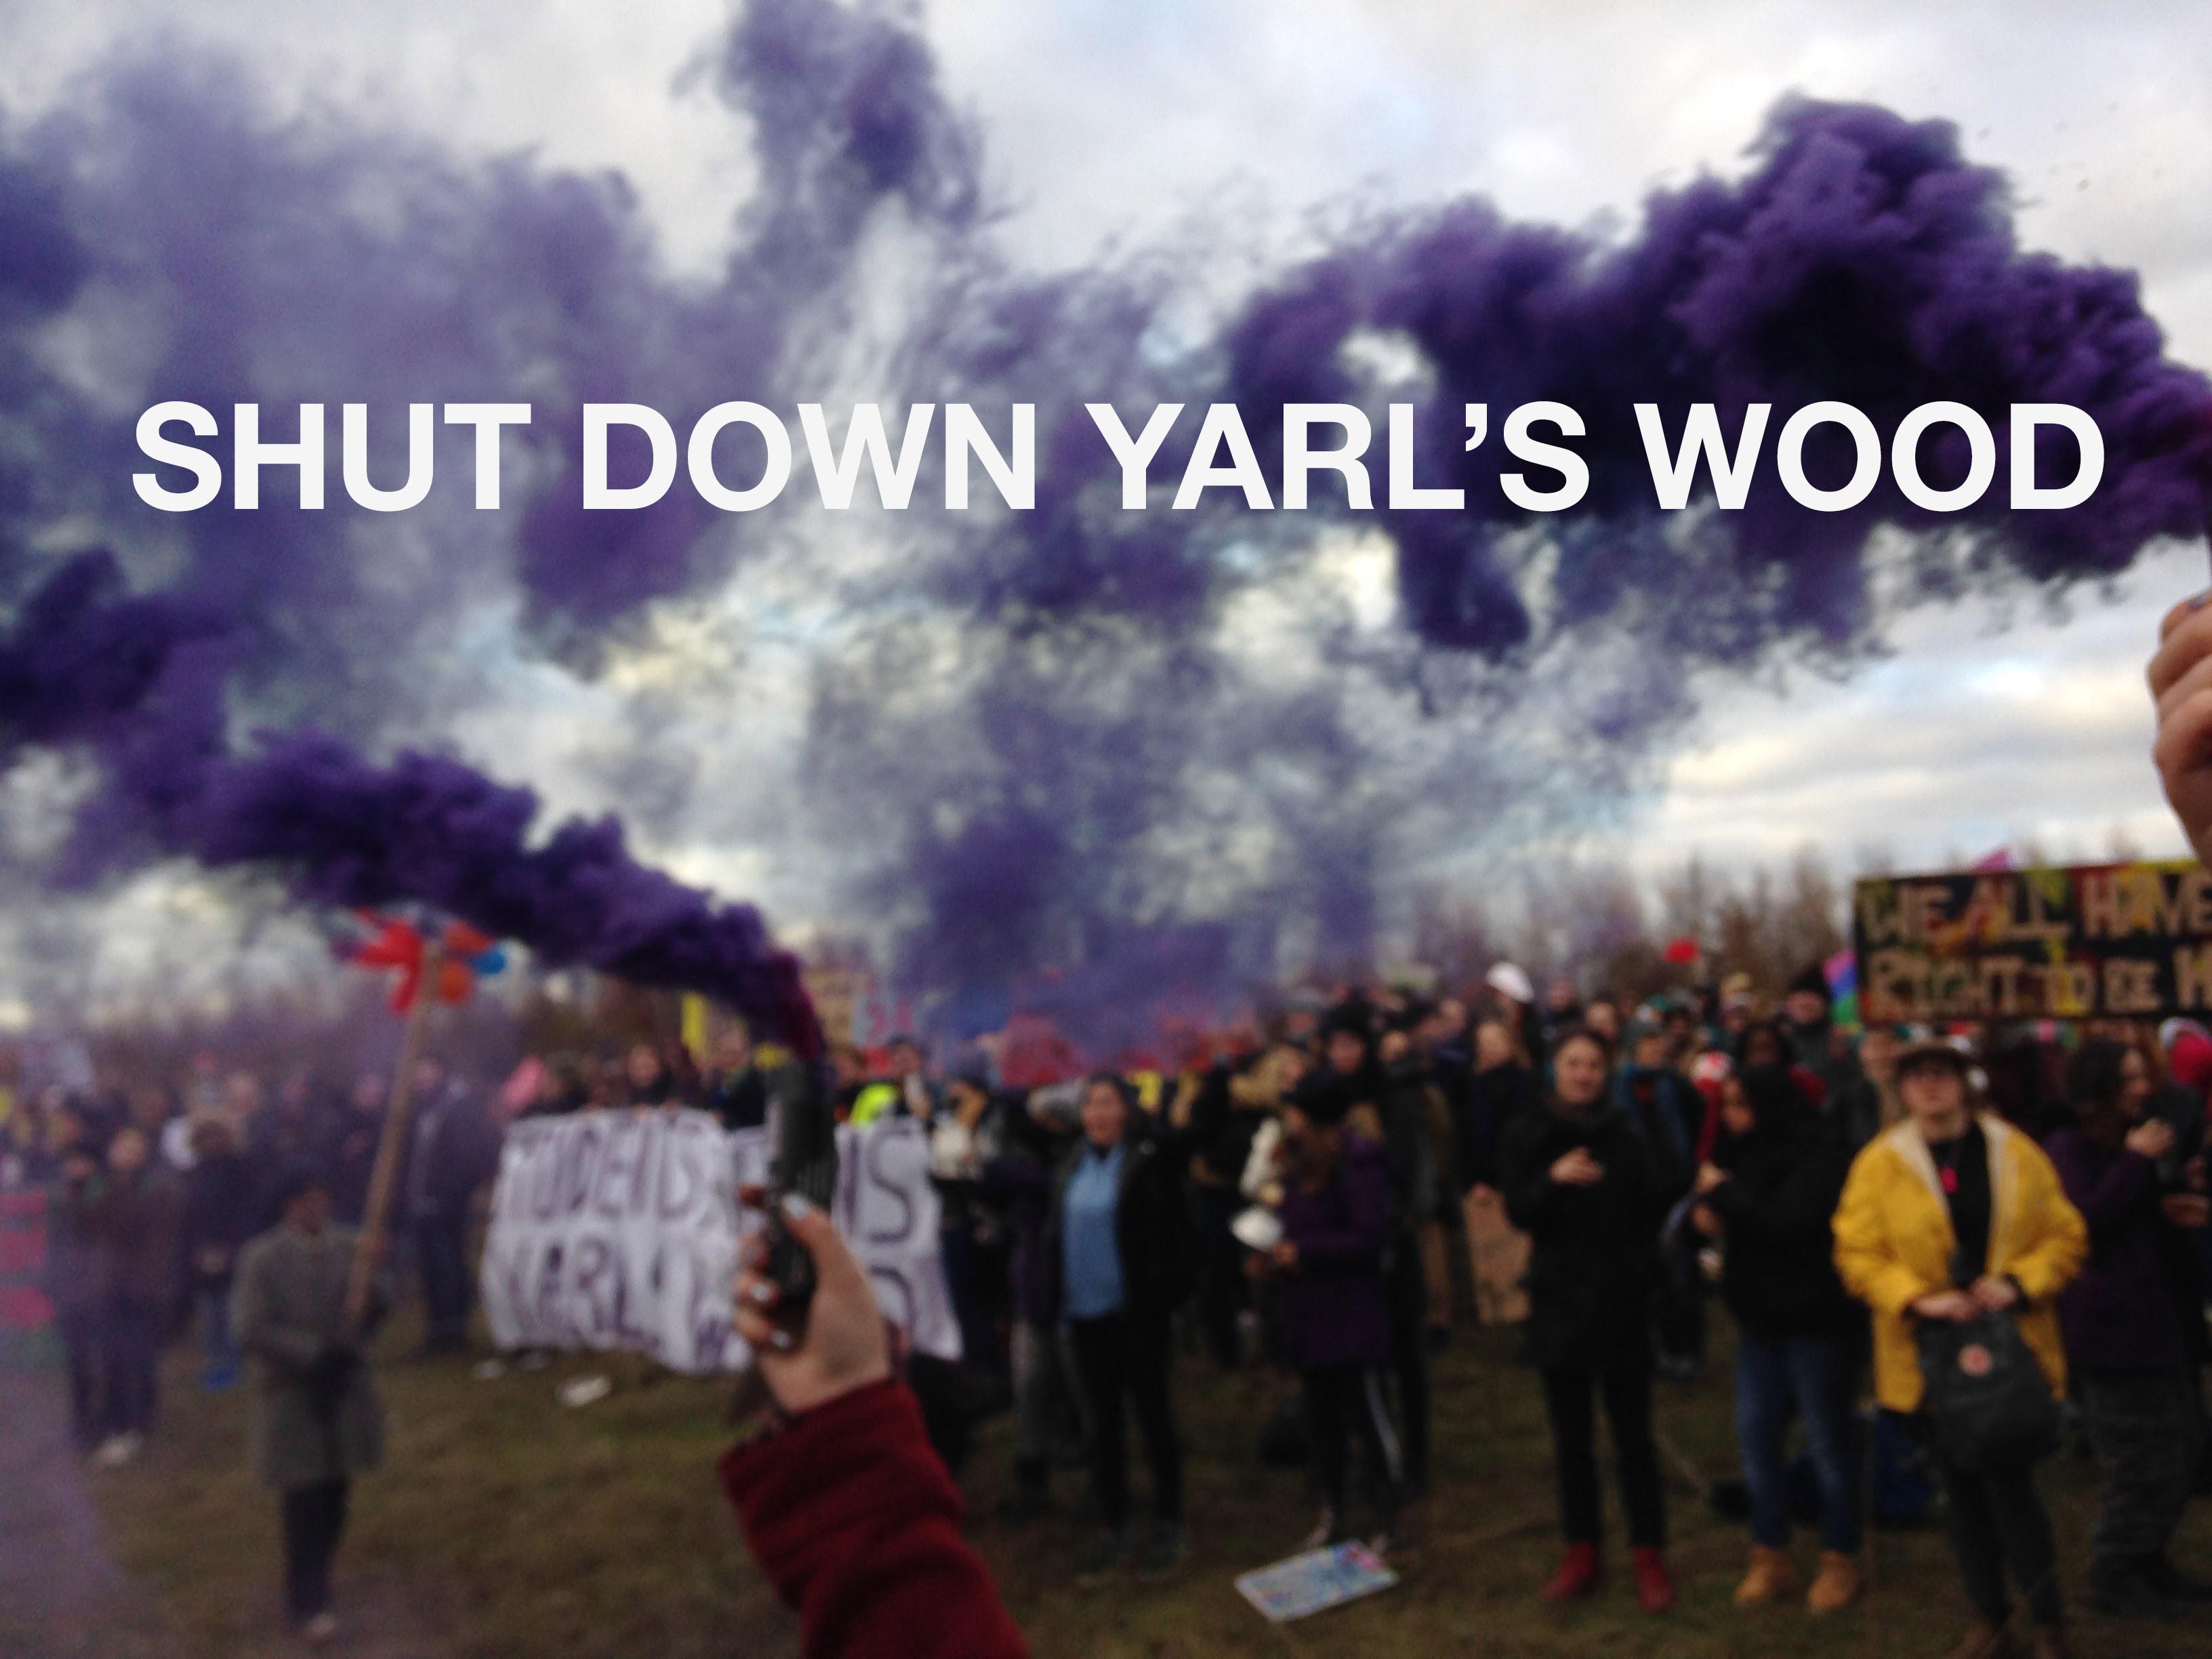 shut down yarls wood